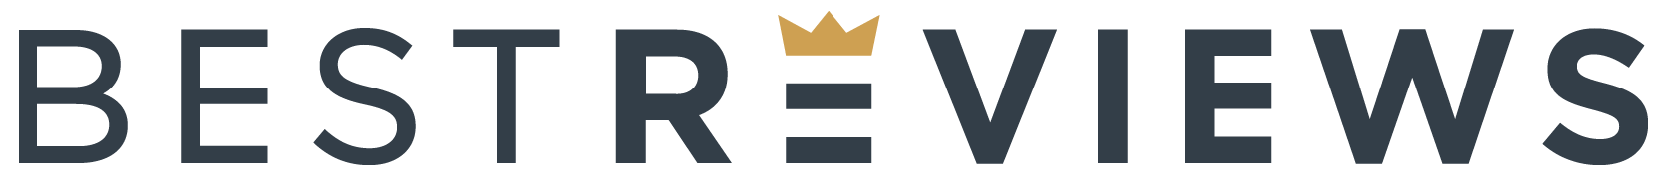 eyebrow_logo